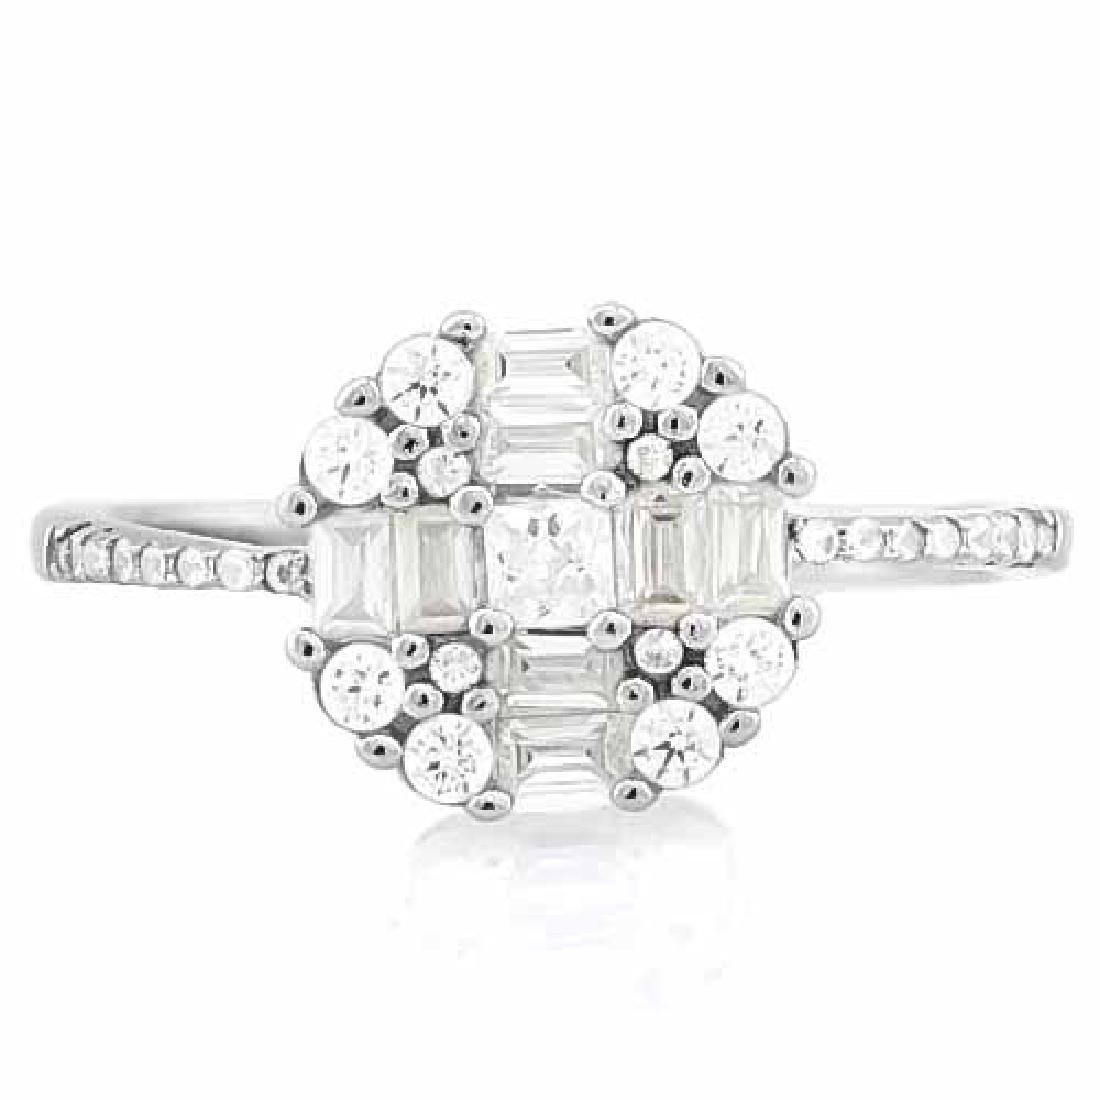 1 4/5 CARAT (25 PCS) FLAWLESS CREATED DIAMOND 925 STERL